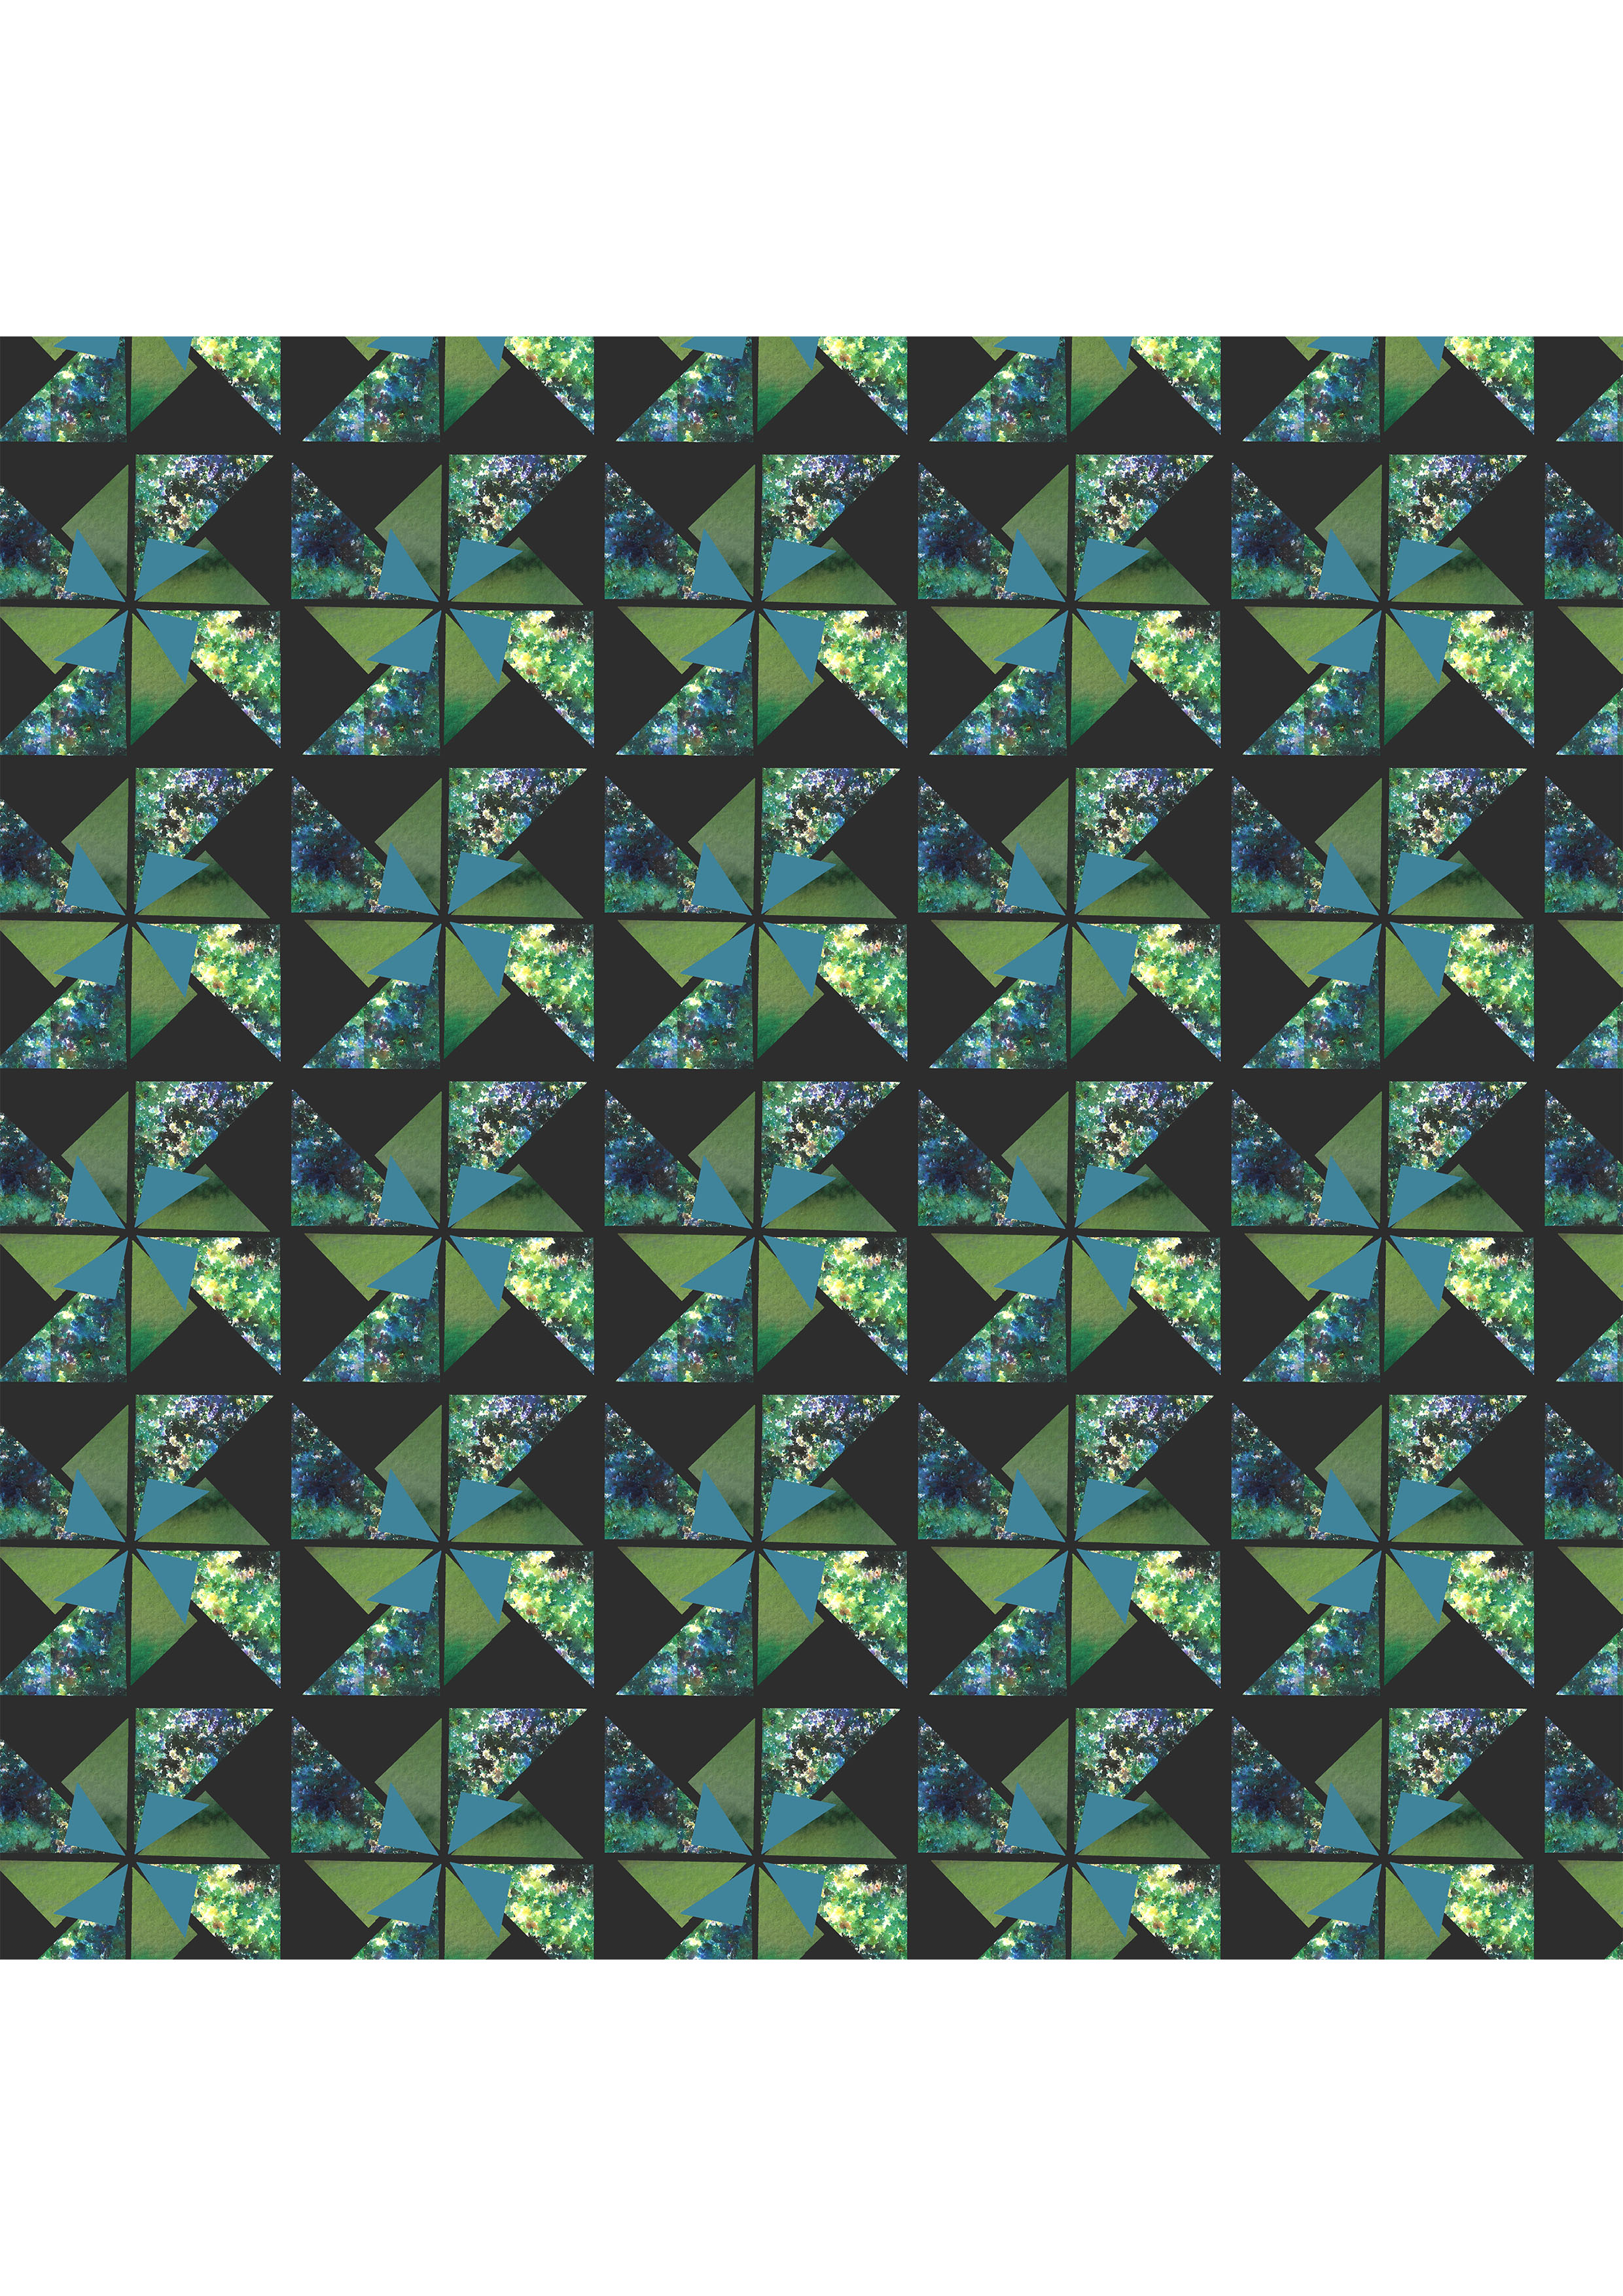 Untitled-2_0007_2 copy.jpg